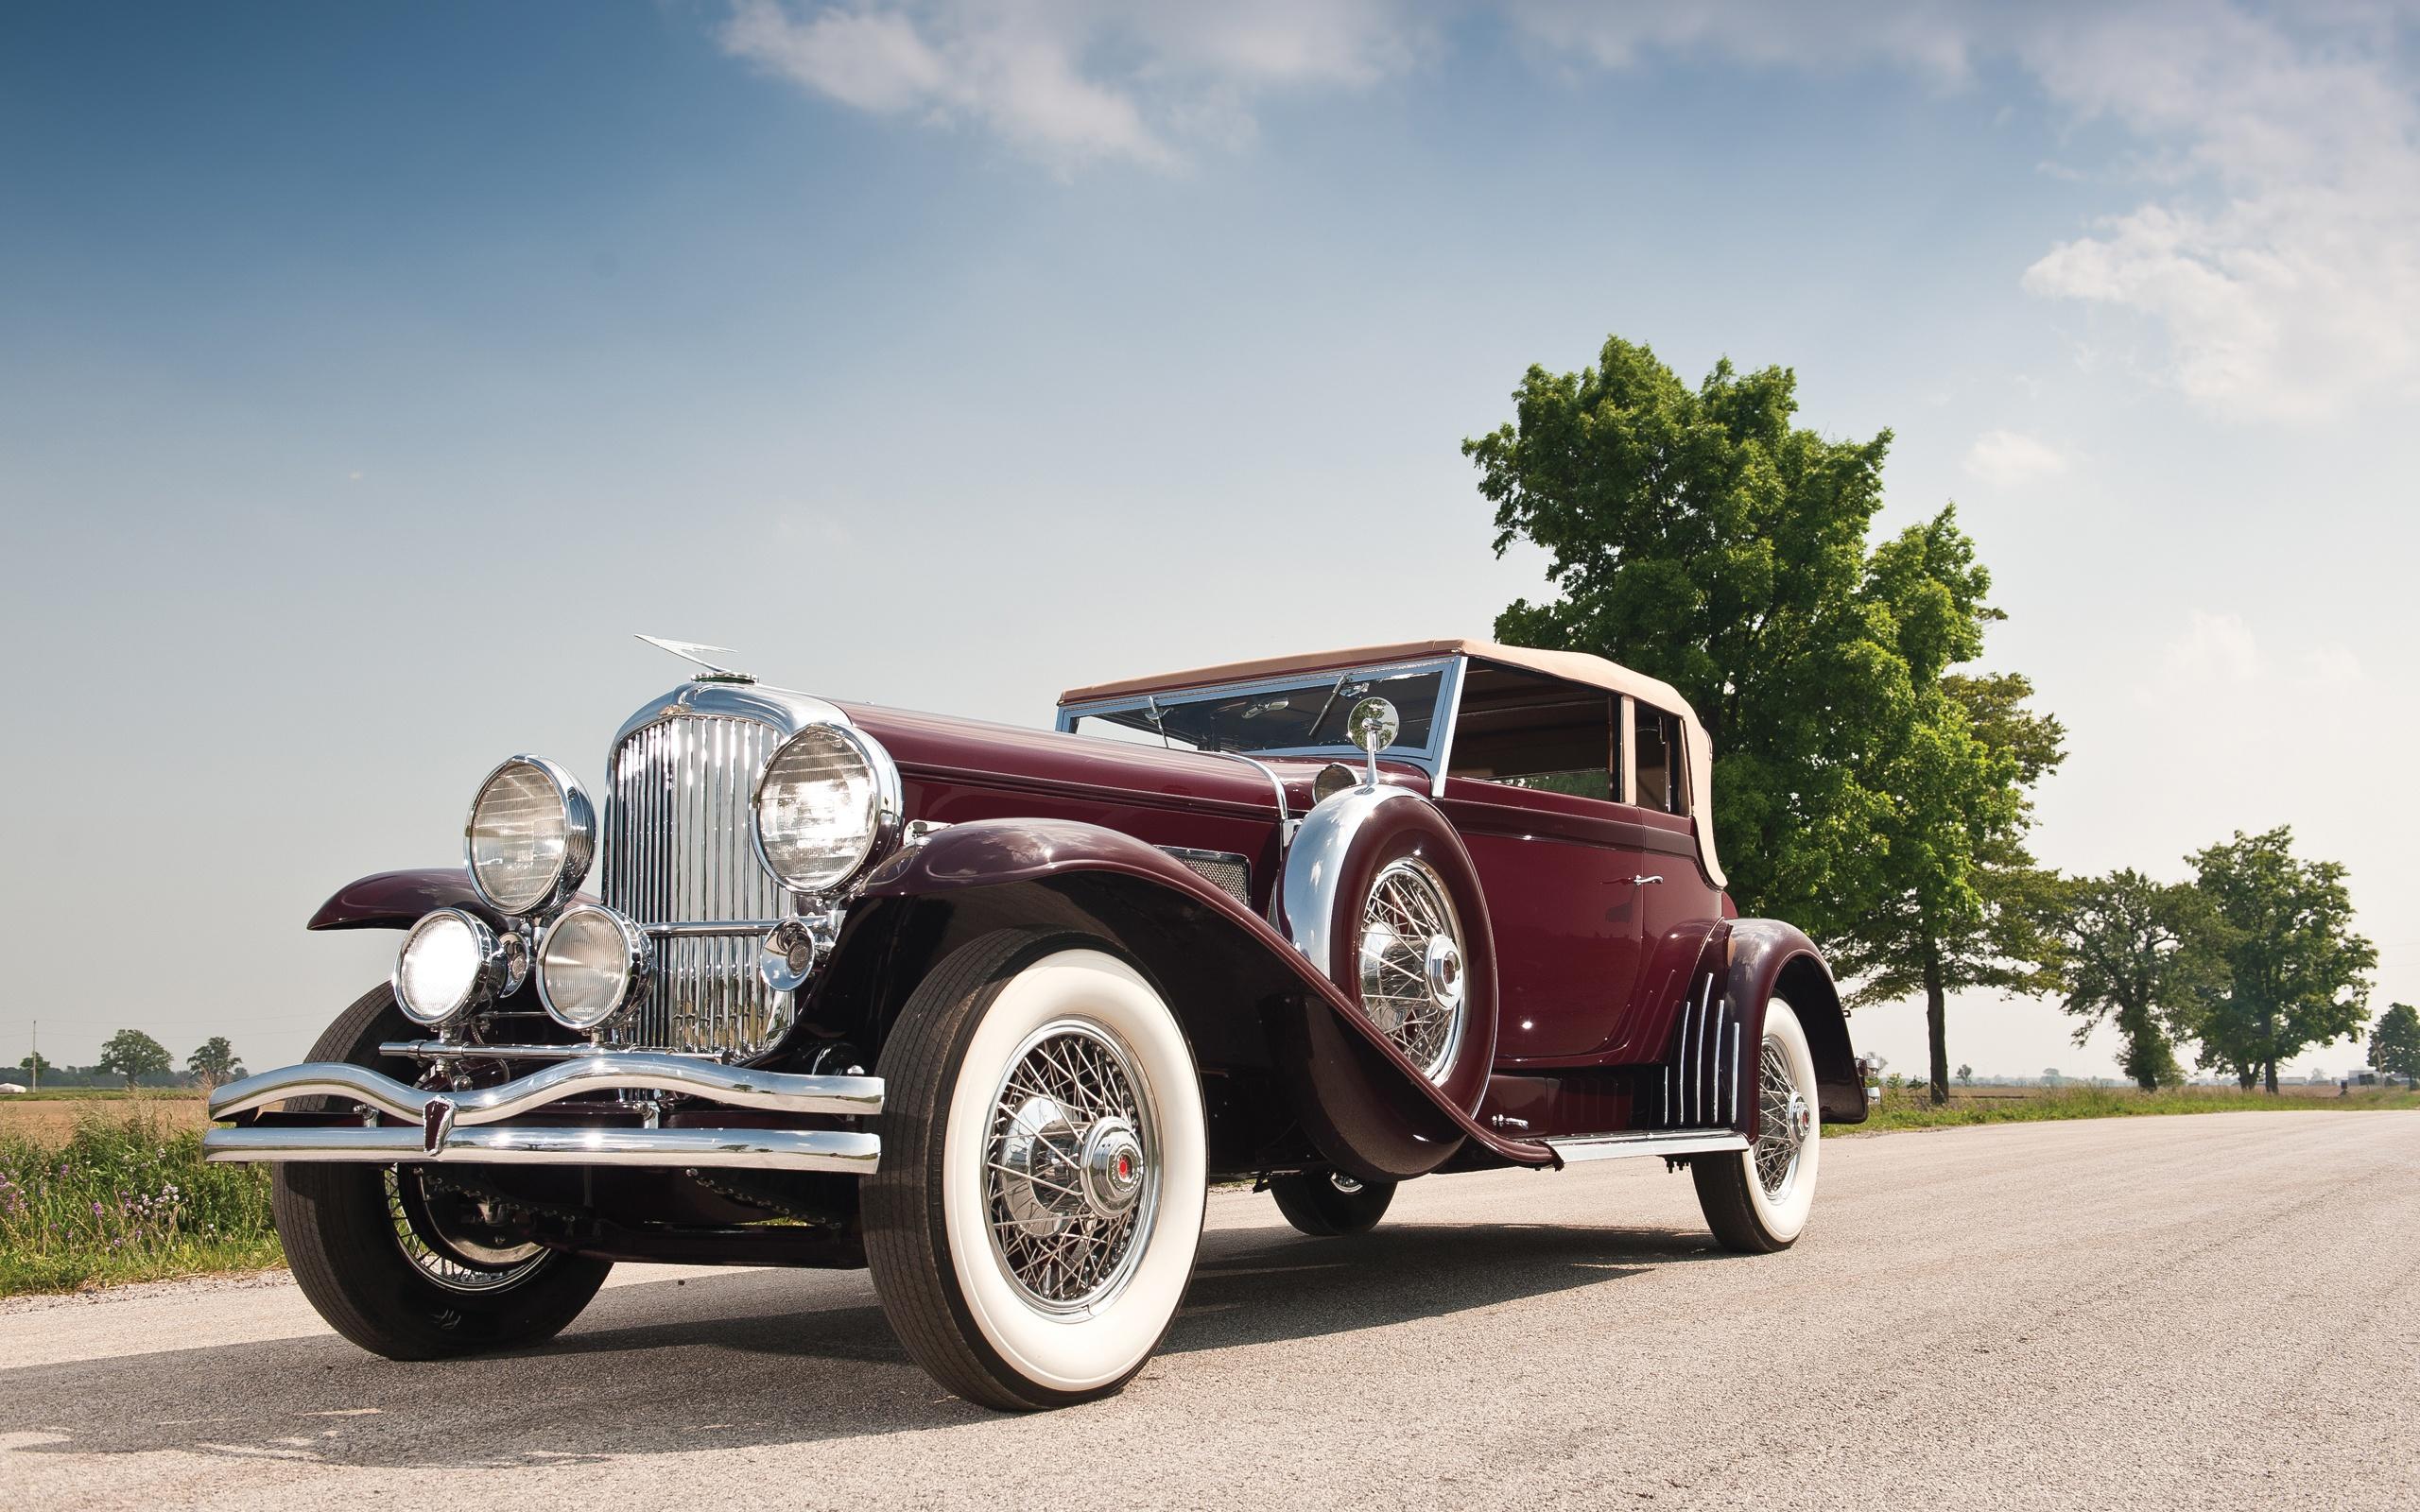 duesenberg vintage car wallpapers - photo #1